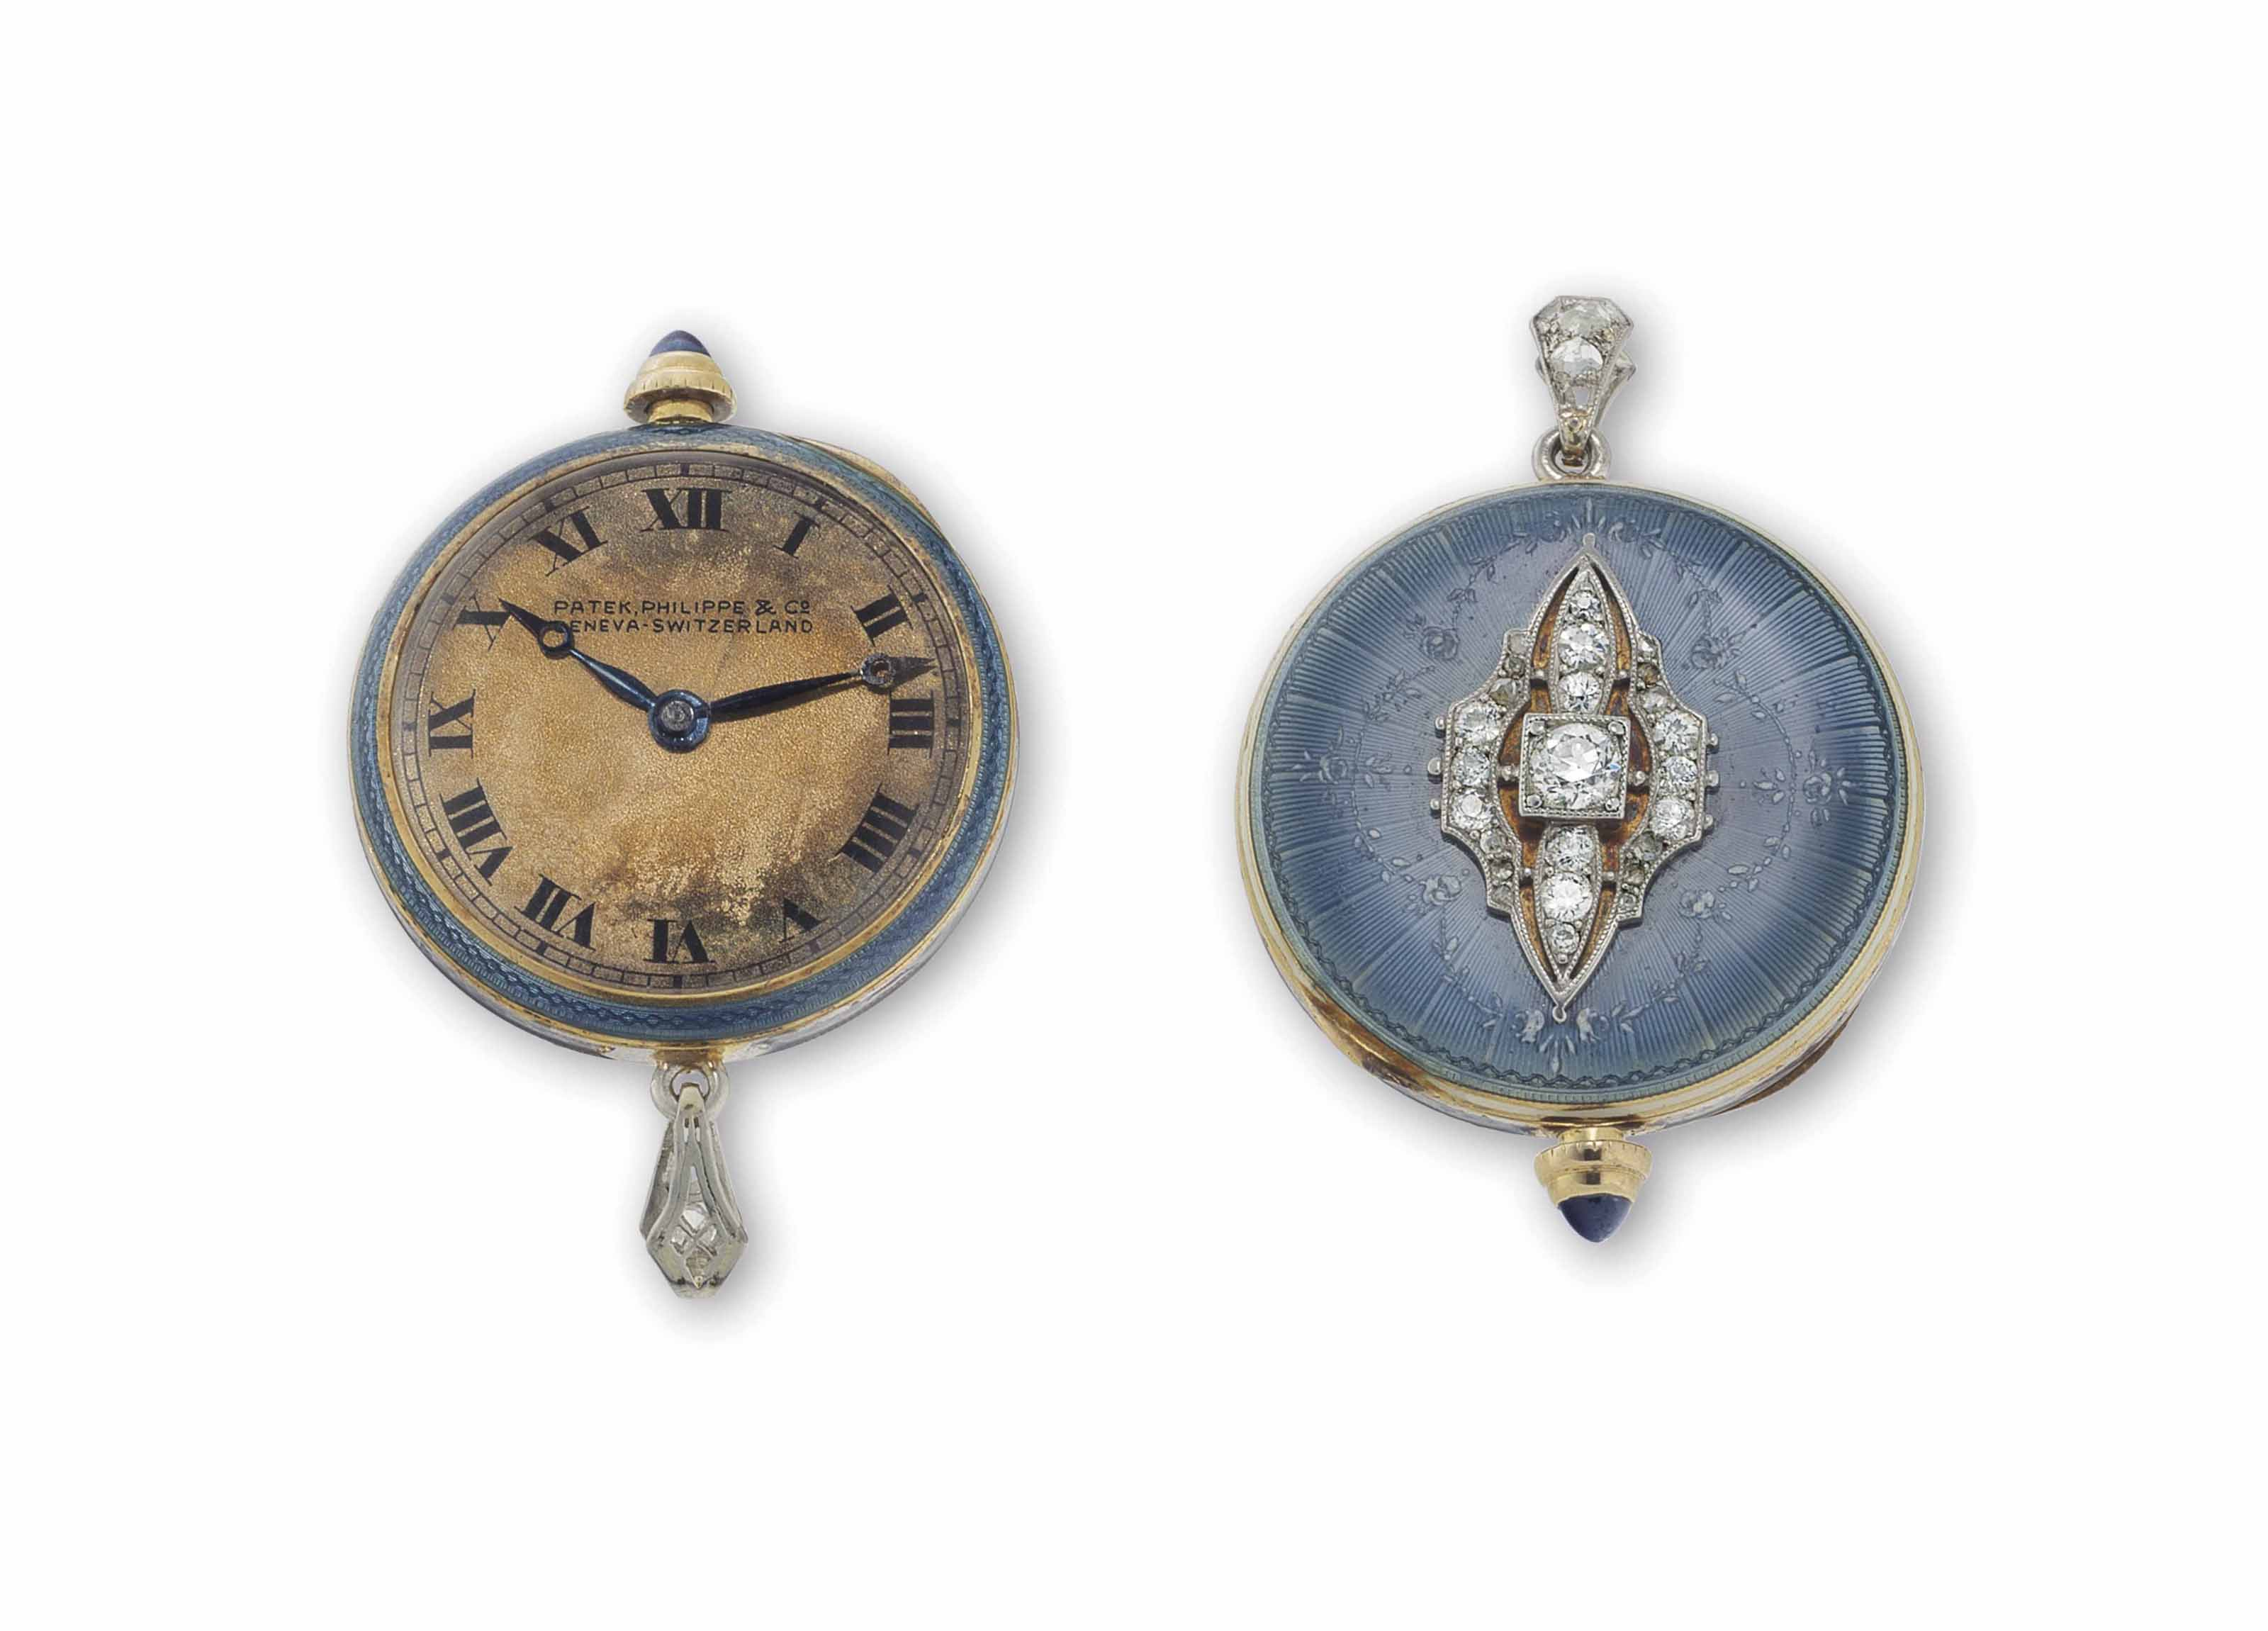 Patek Philippe. A Lady's 18k Gold, Enamel and Diamond-set Keyless Lever Pendant Watch